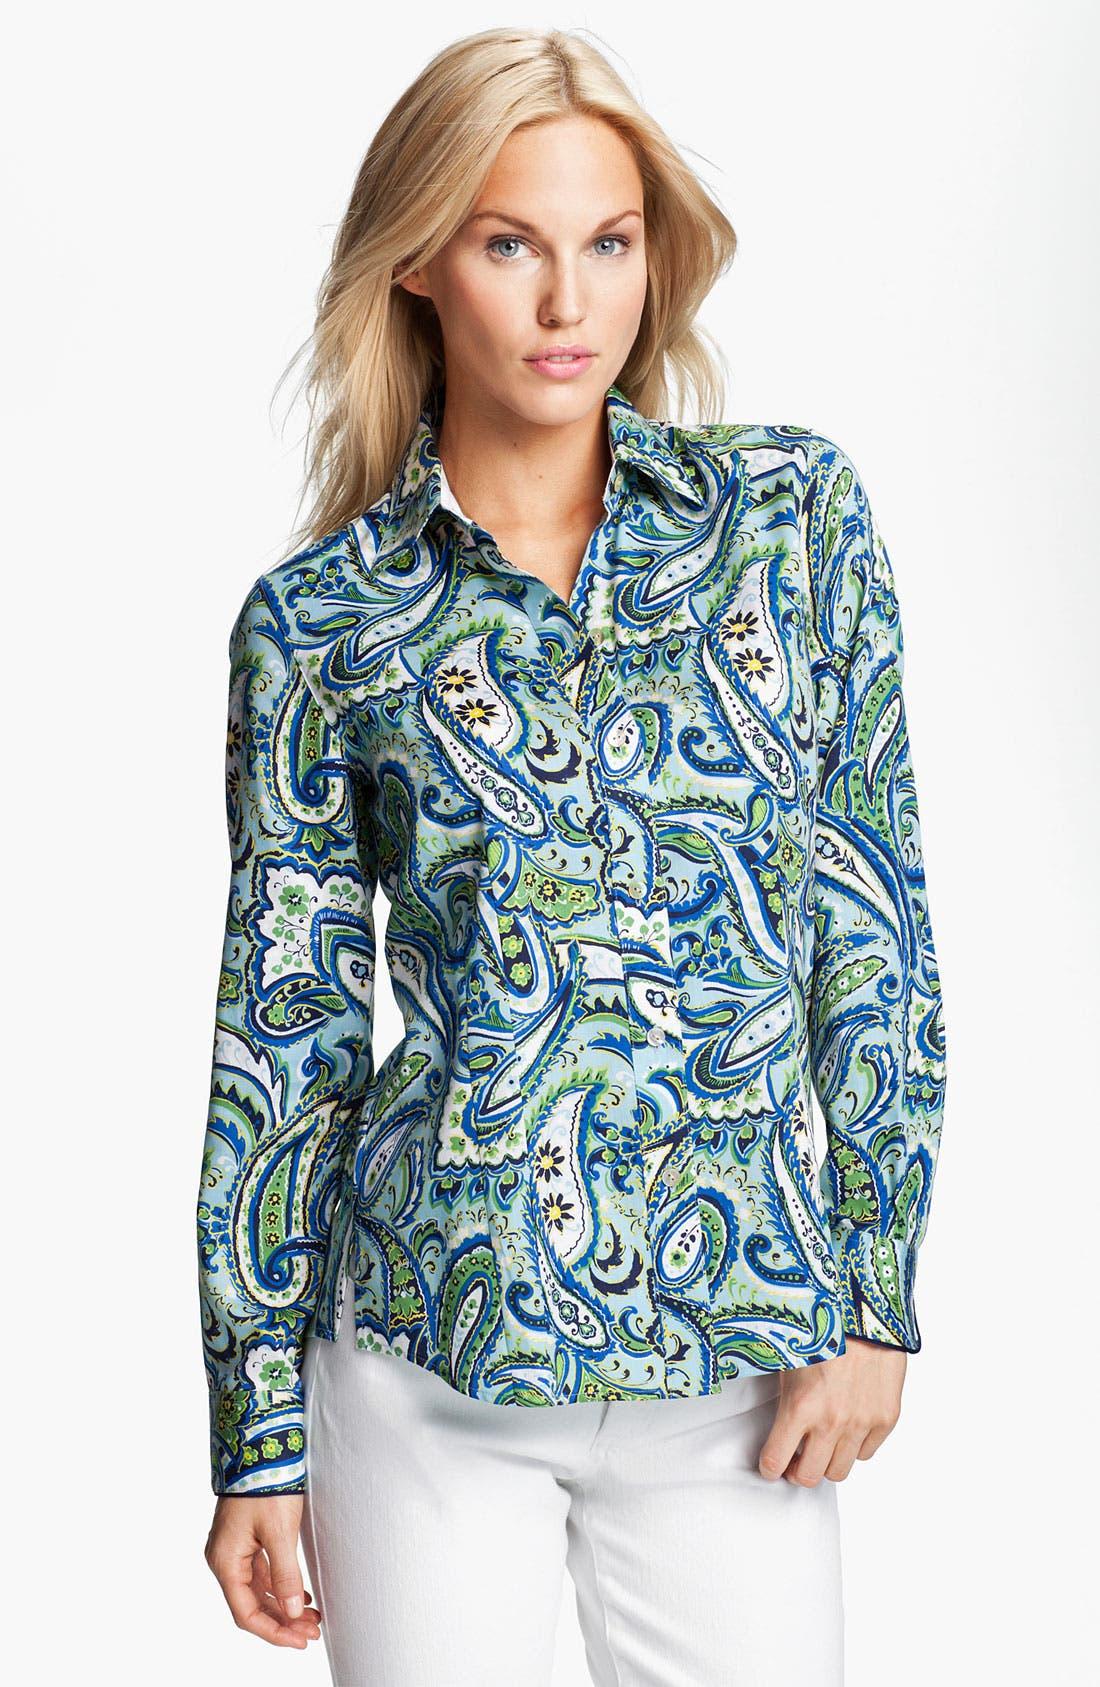 Alternate Image 1 Selected - Foxcroft 'Marina Paisley' Shirt